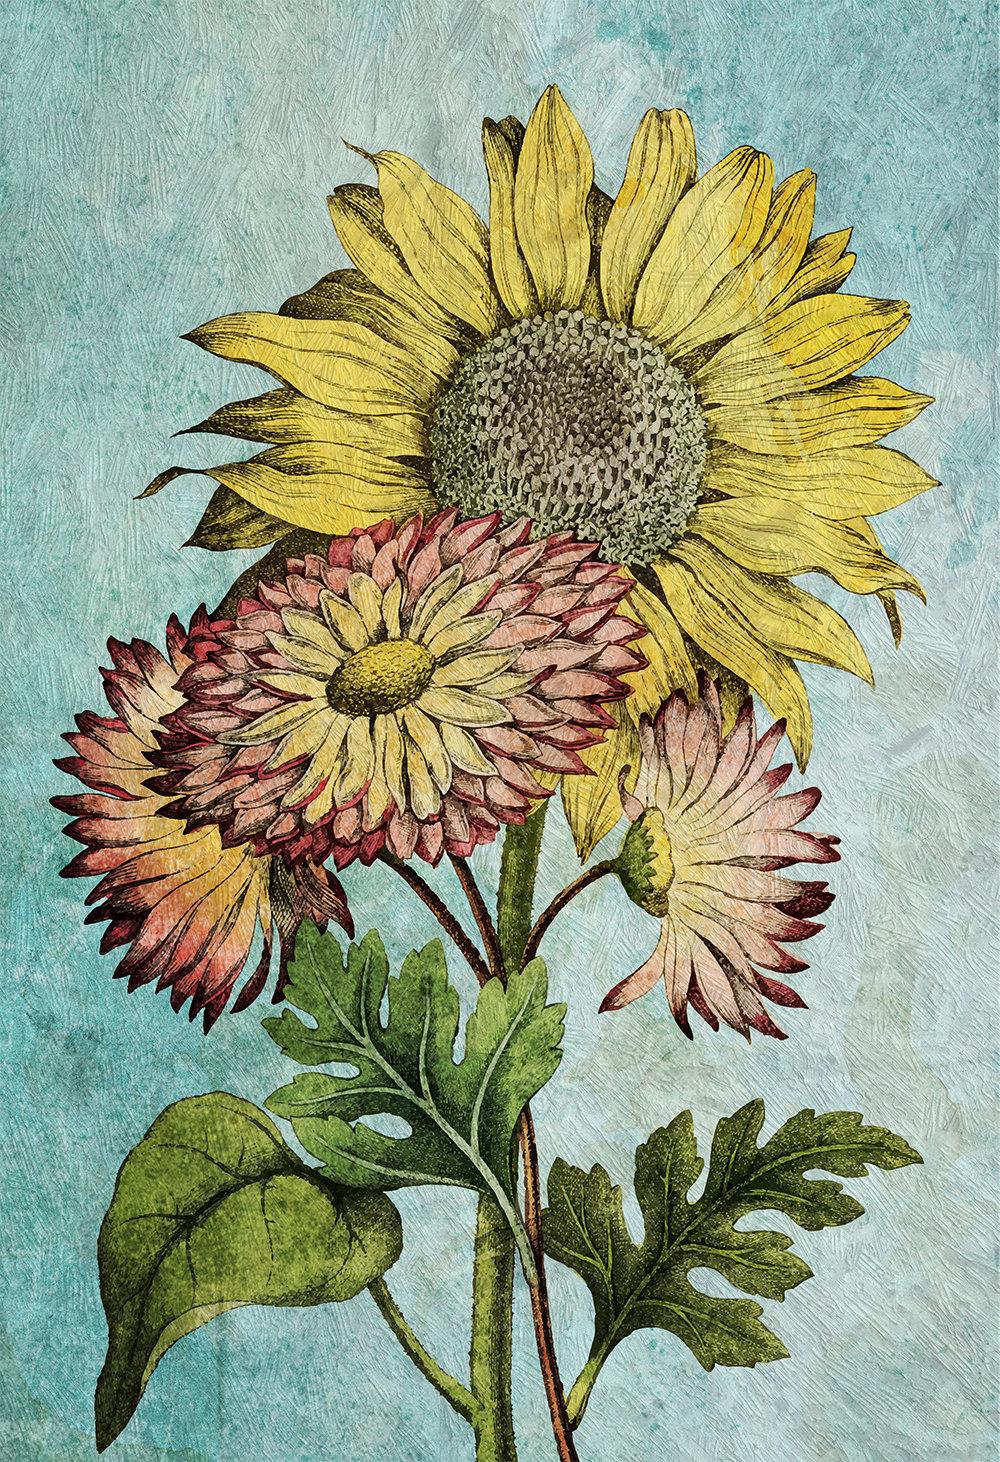 sunflower decor sunflower art sunflower gift botanical print - Sunflower Kitchen